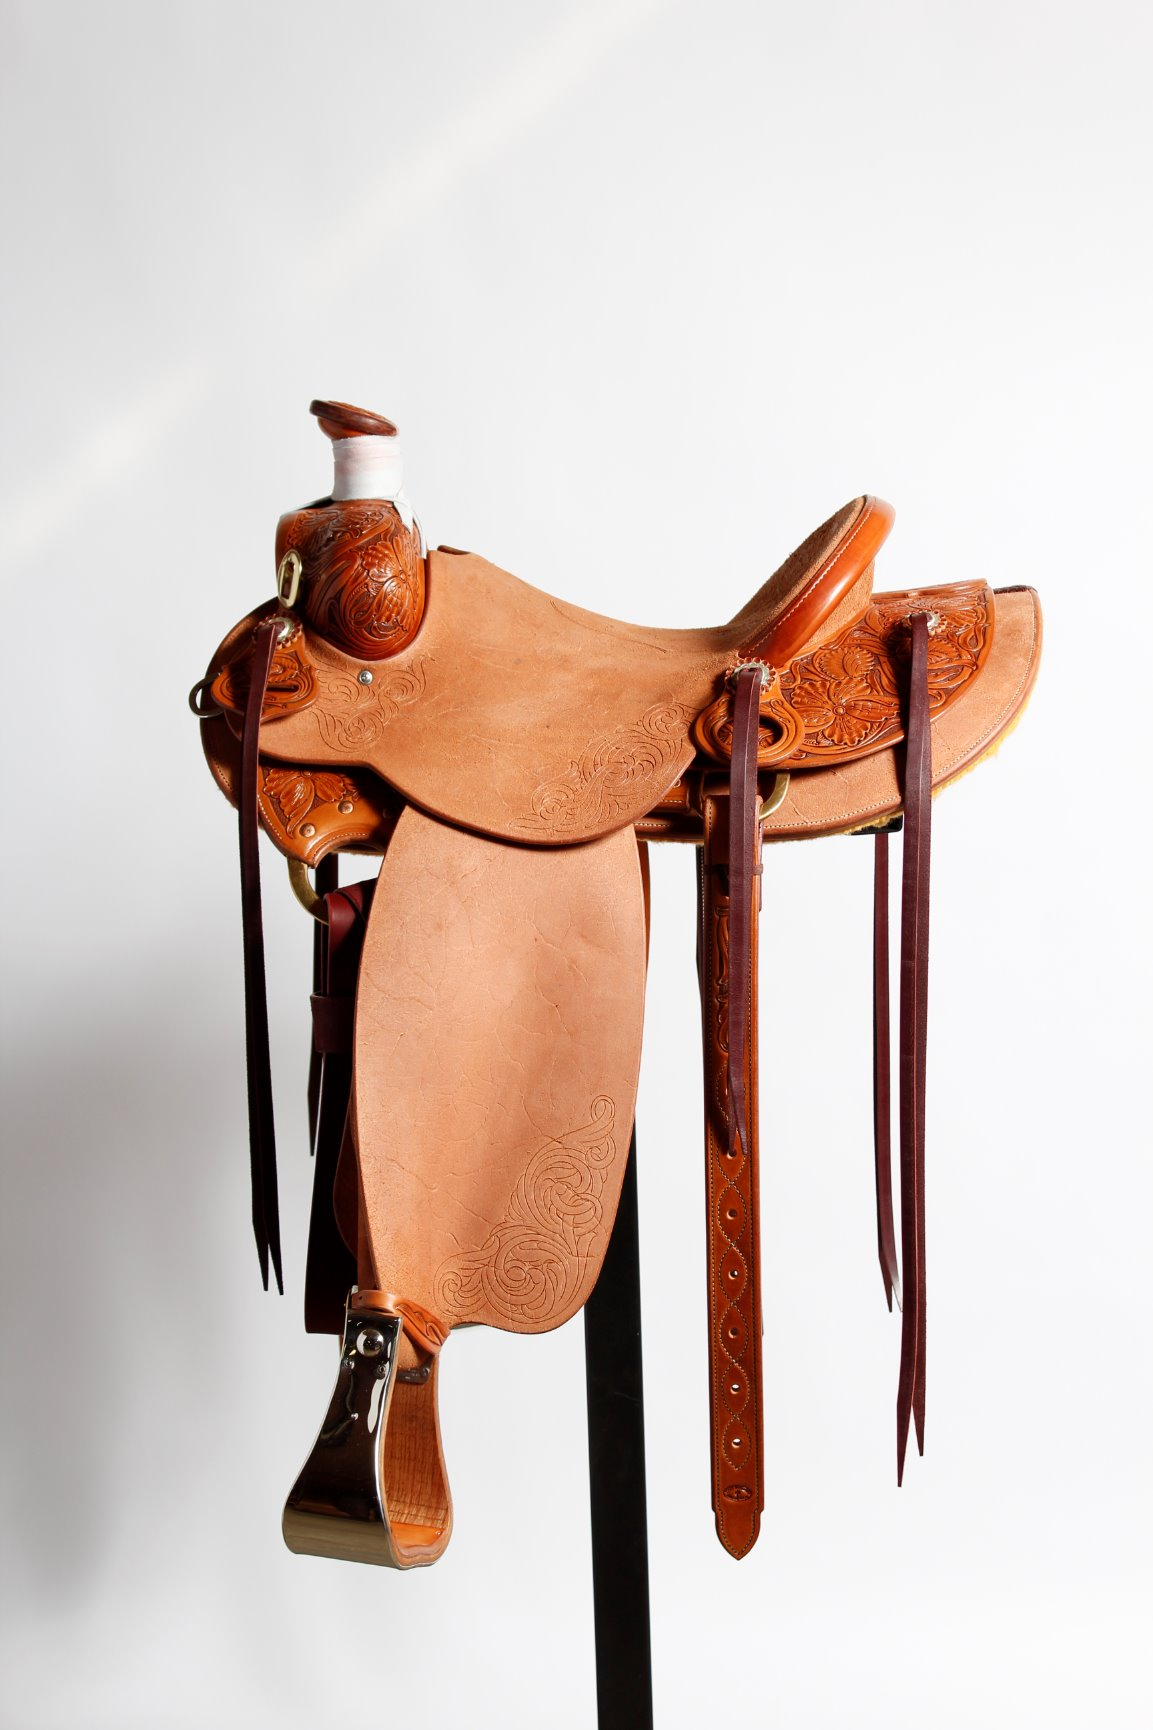 McCulloch Saddlery, custom saddles built by cowboys for cowboys